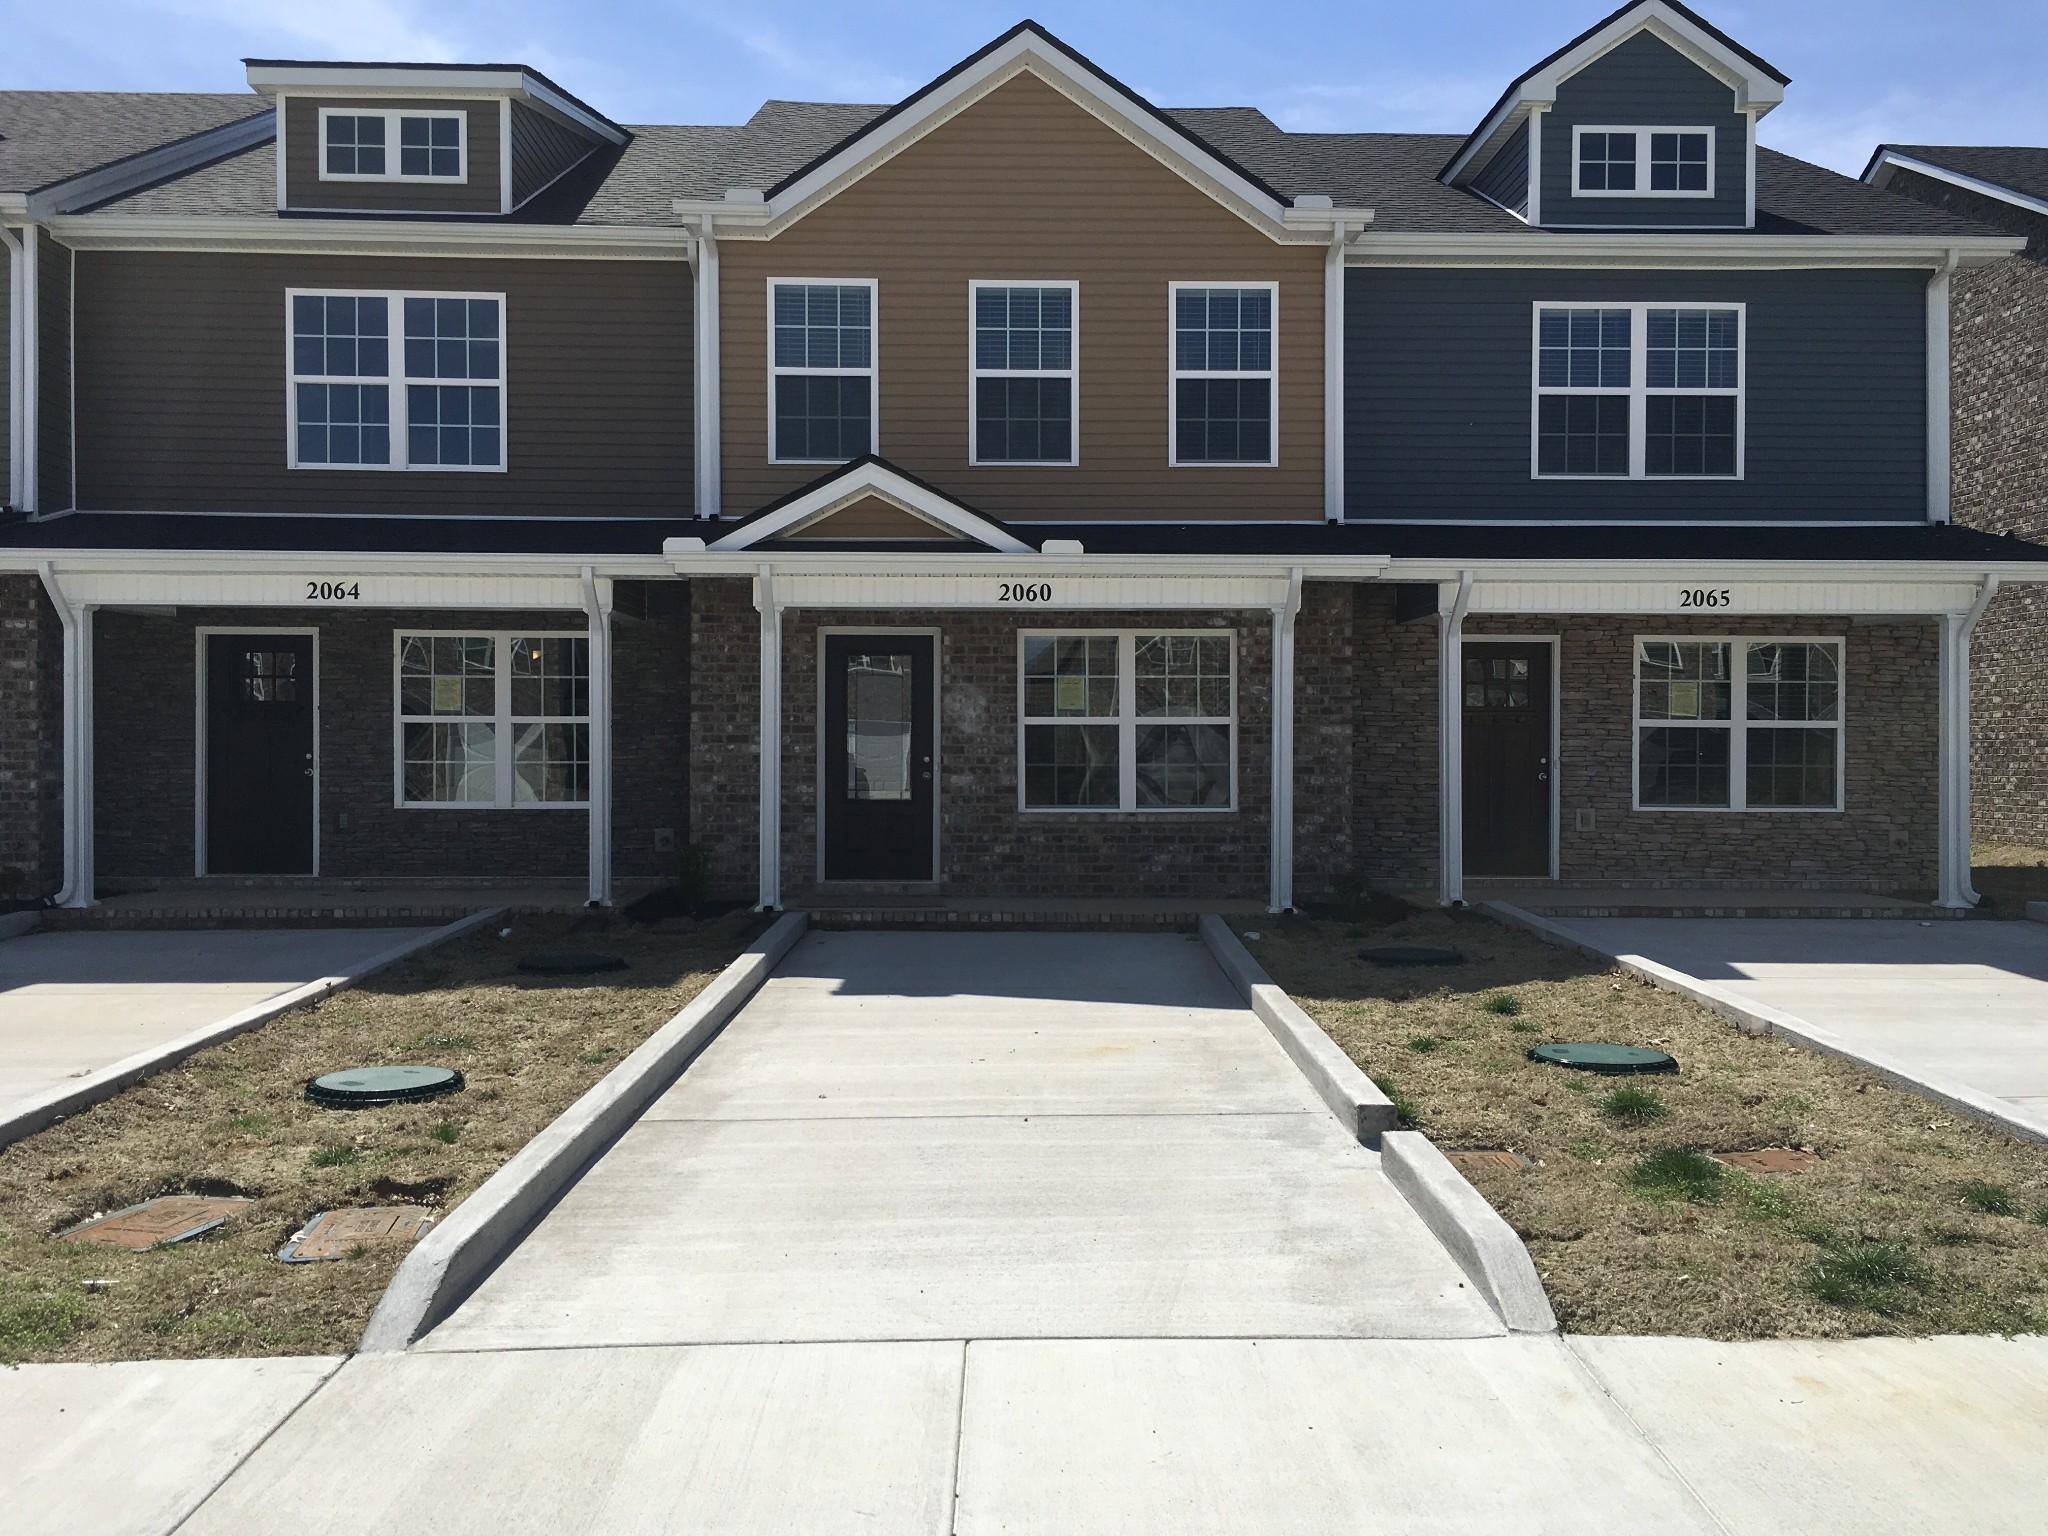 12 Unit 12 Bradley Bend, Ashland City, TN 37015 - Ashland City, TN real estate listing